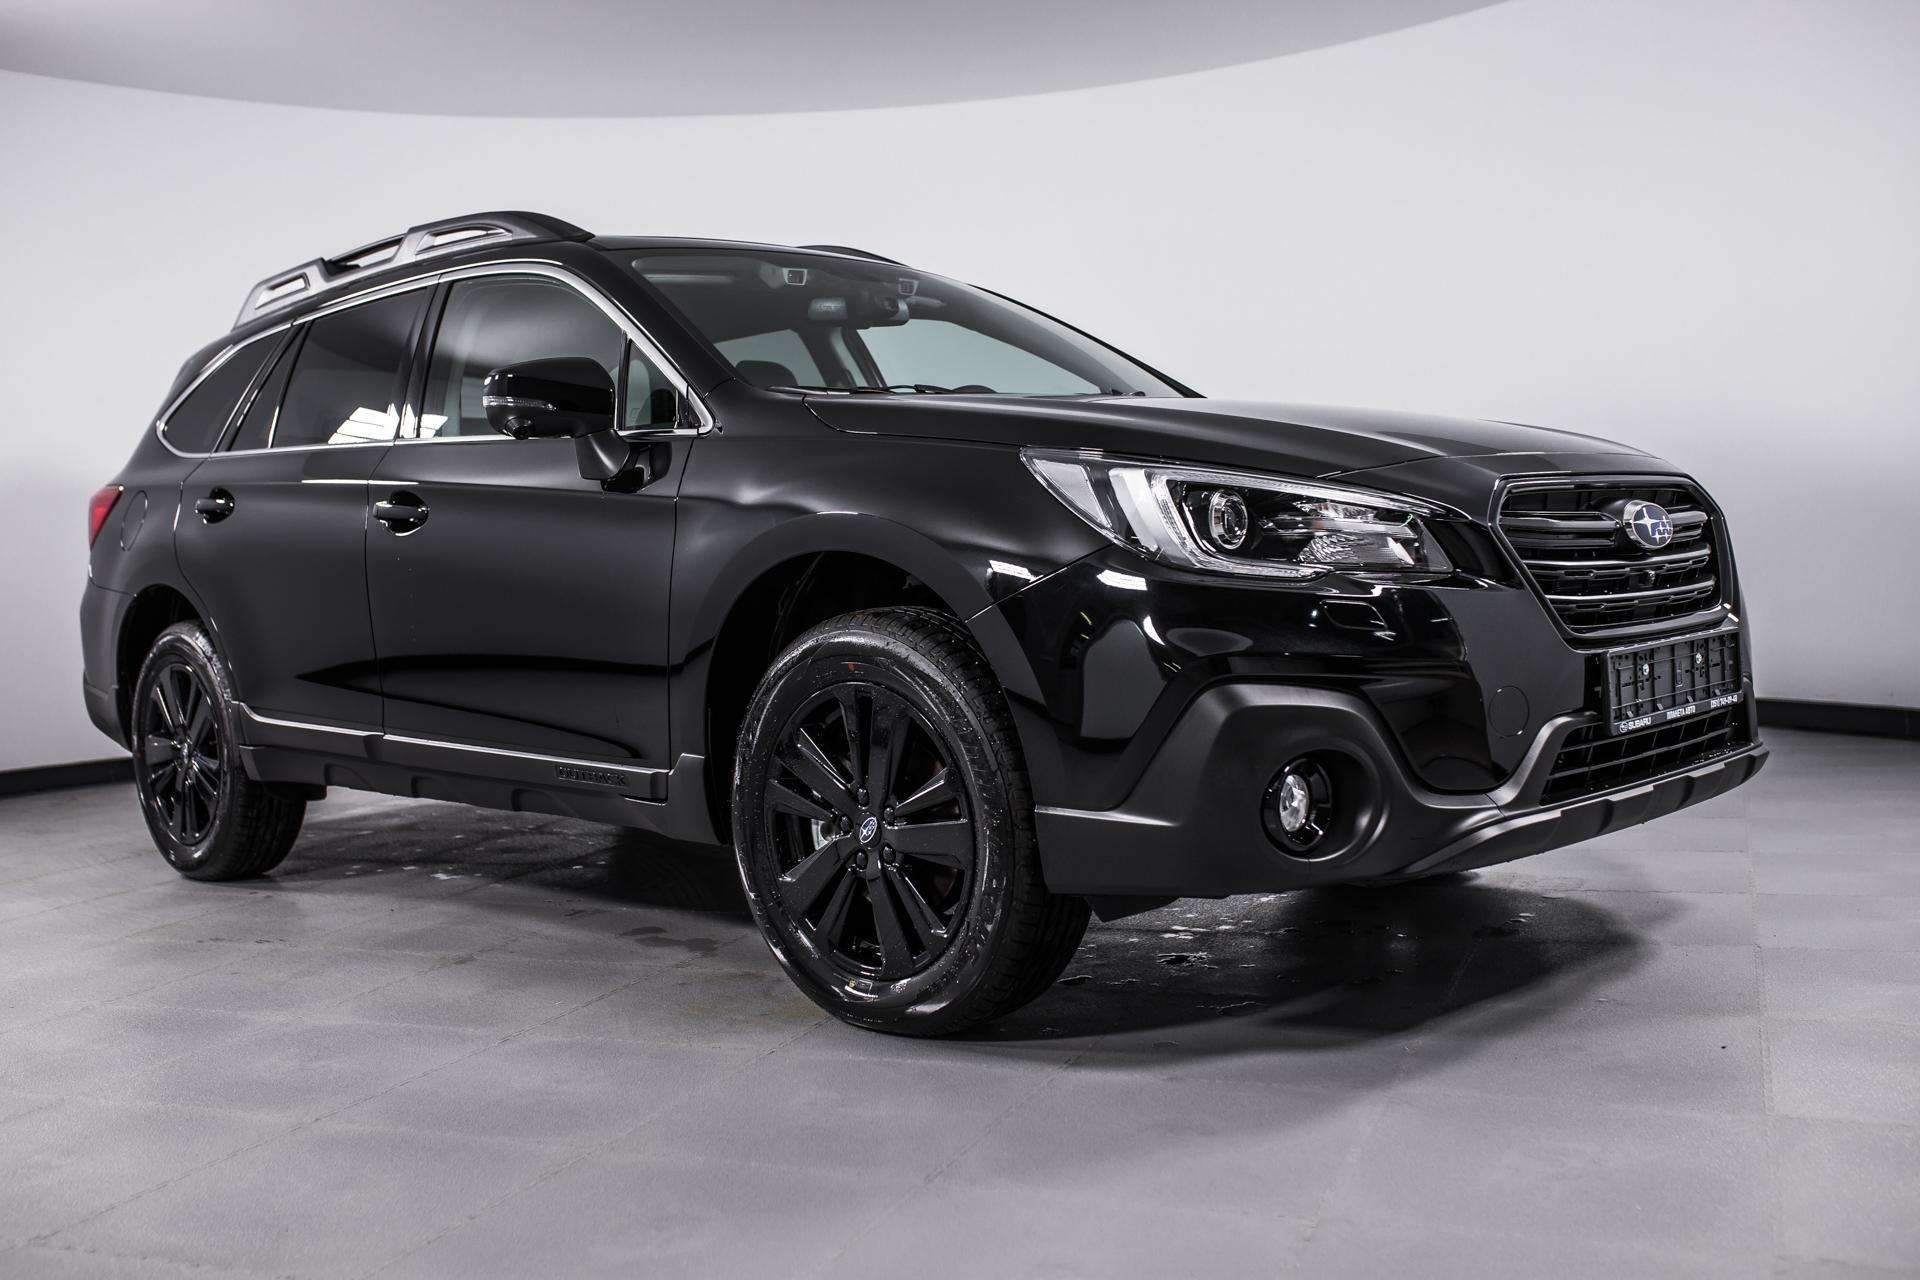 Subaru Outback 2.5 Lineartronic AWD (175 л. с.) Black Line